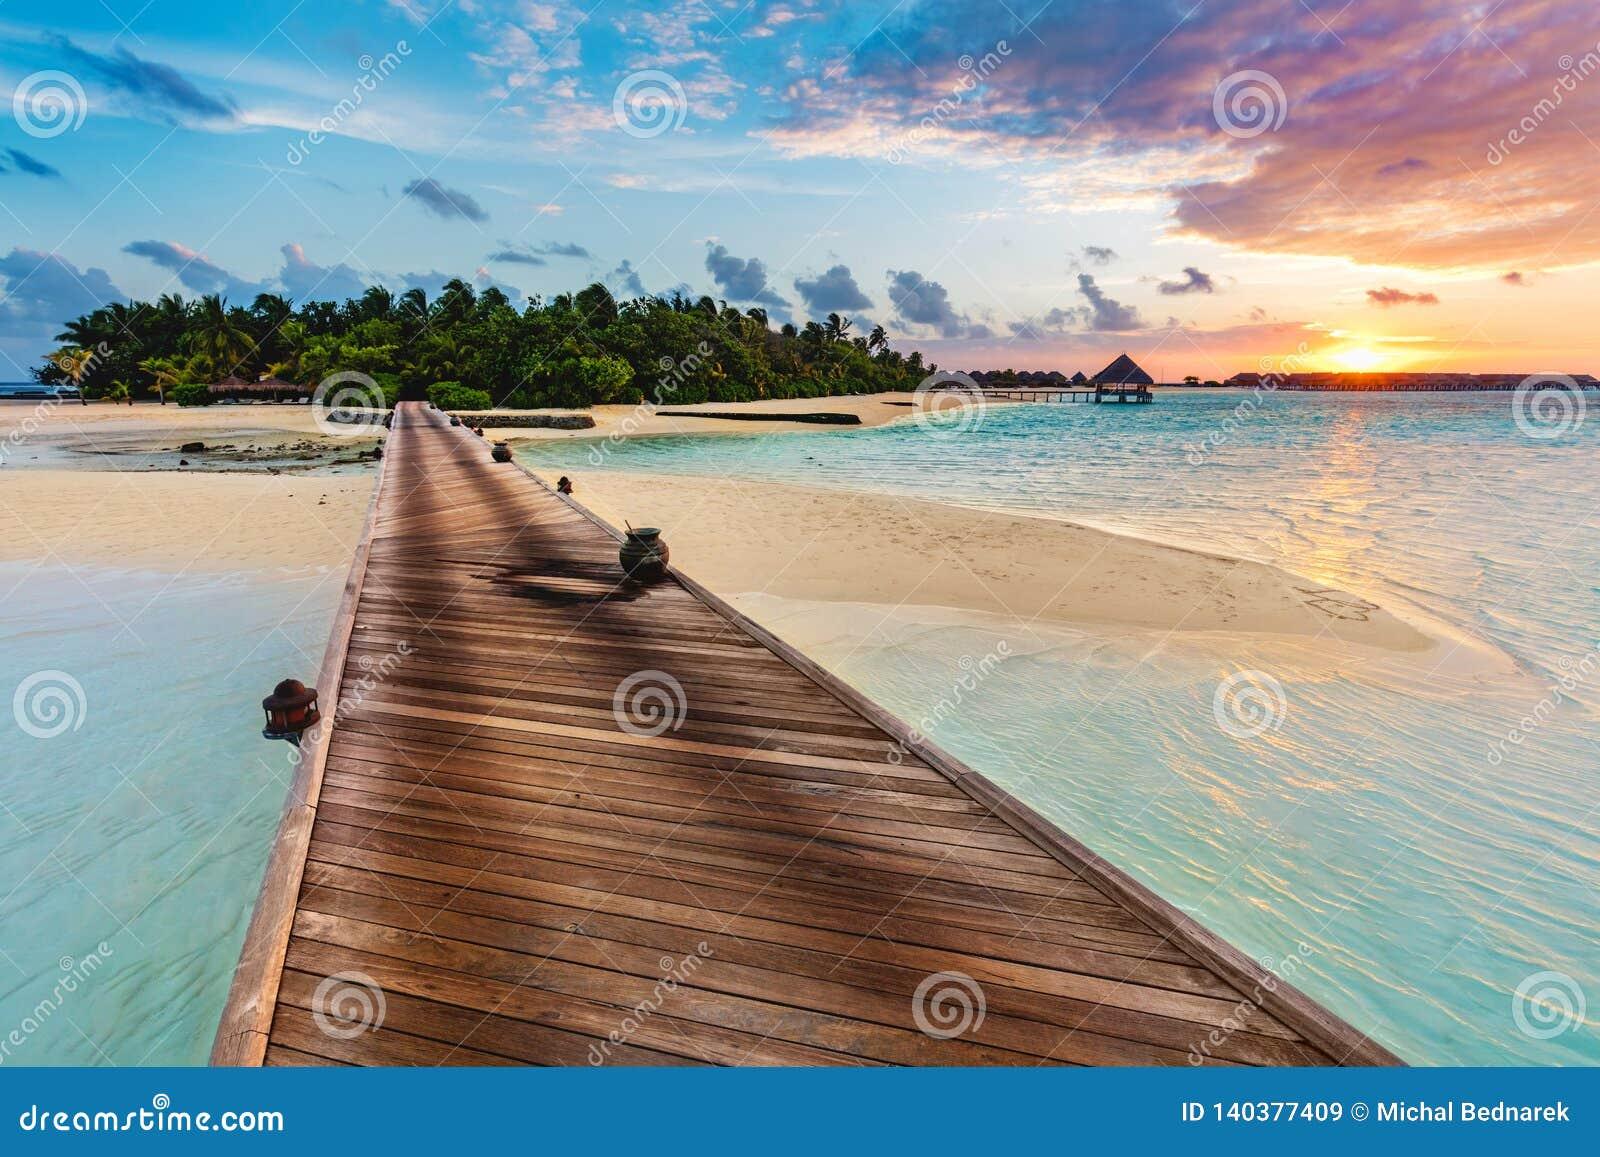 Деревянная мола на голубом море